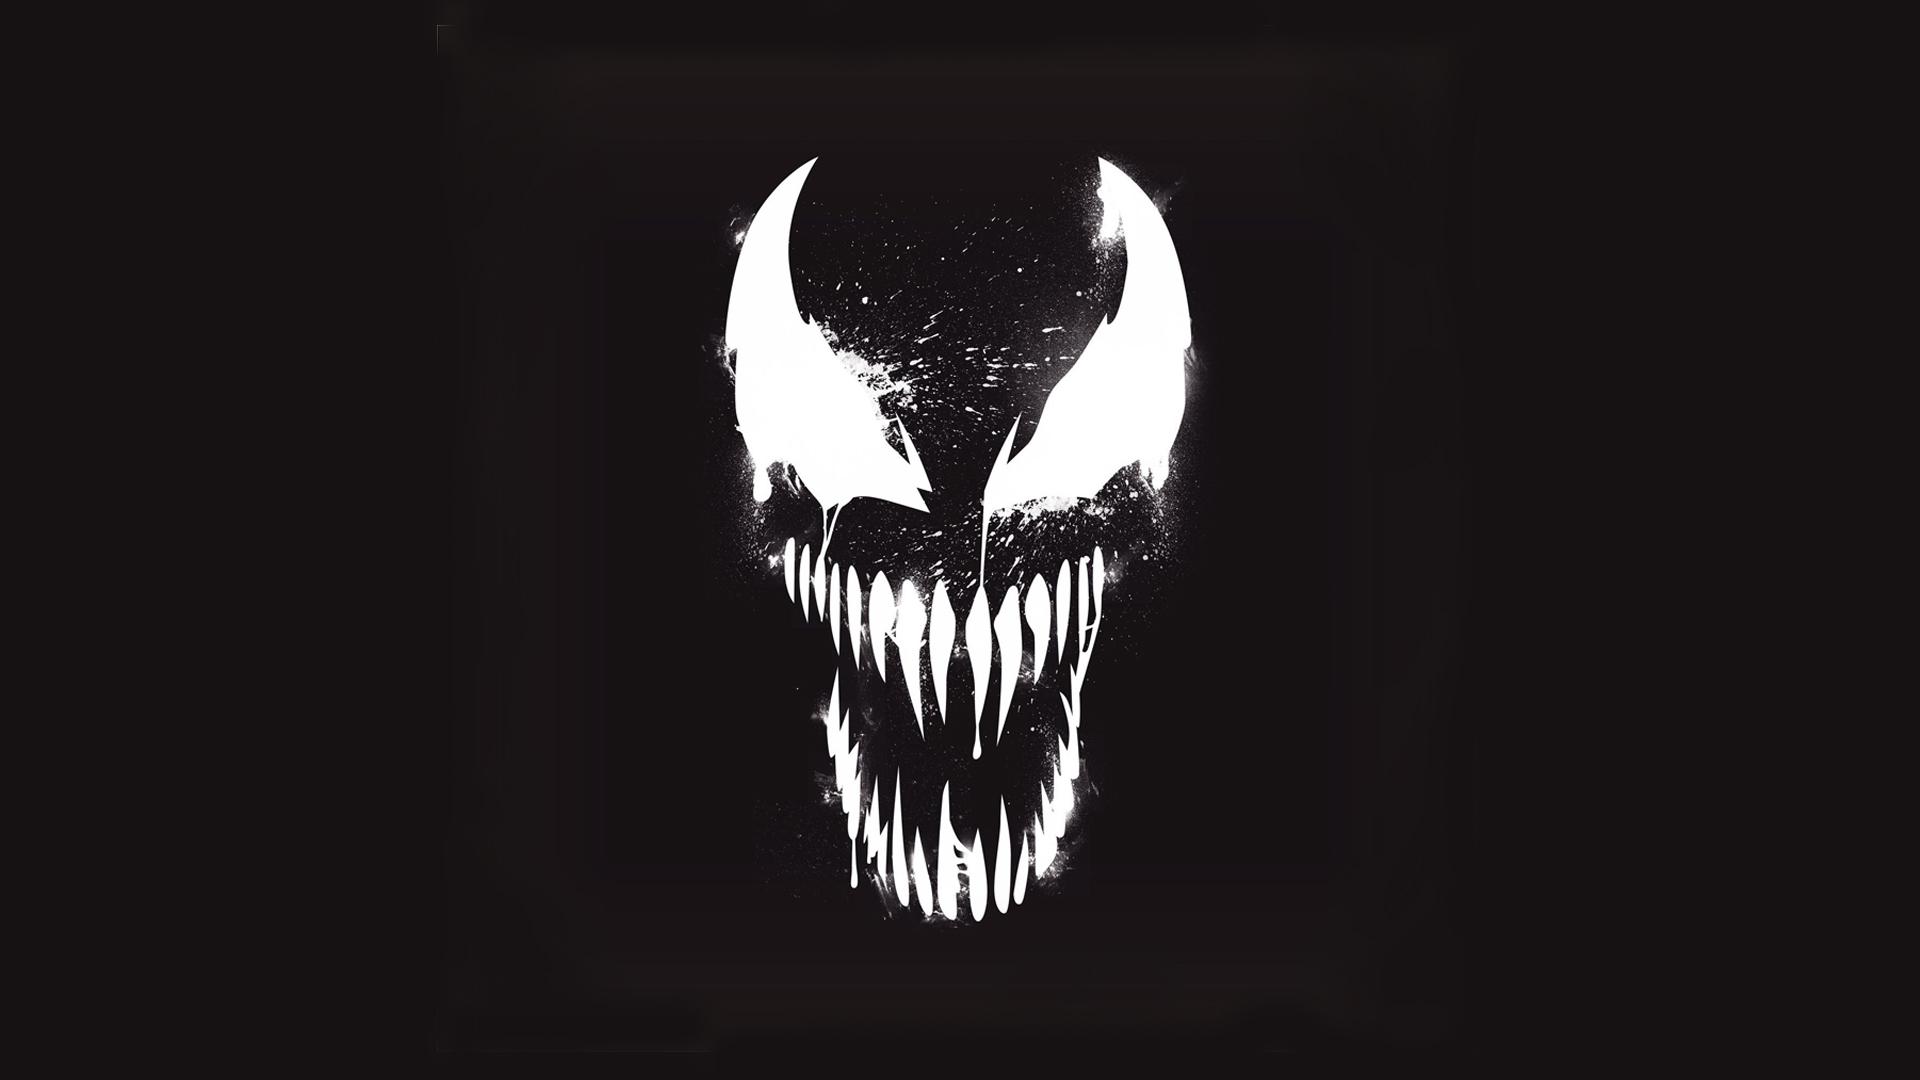 venom marvel artistic logo with dark background hd